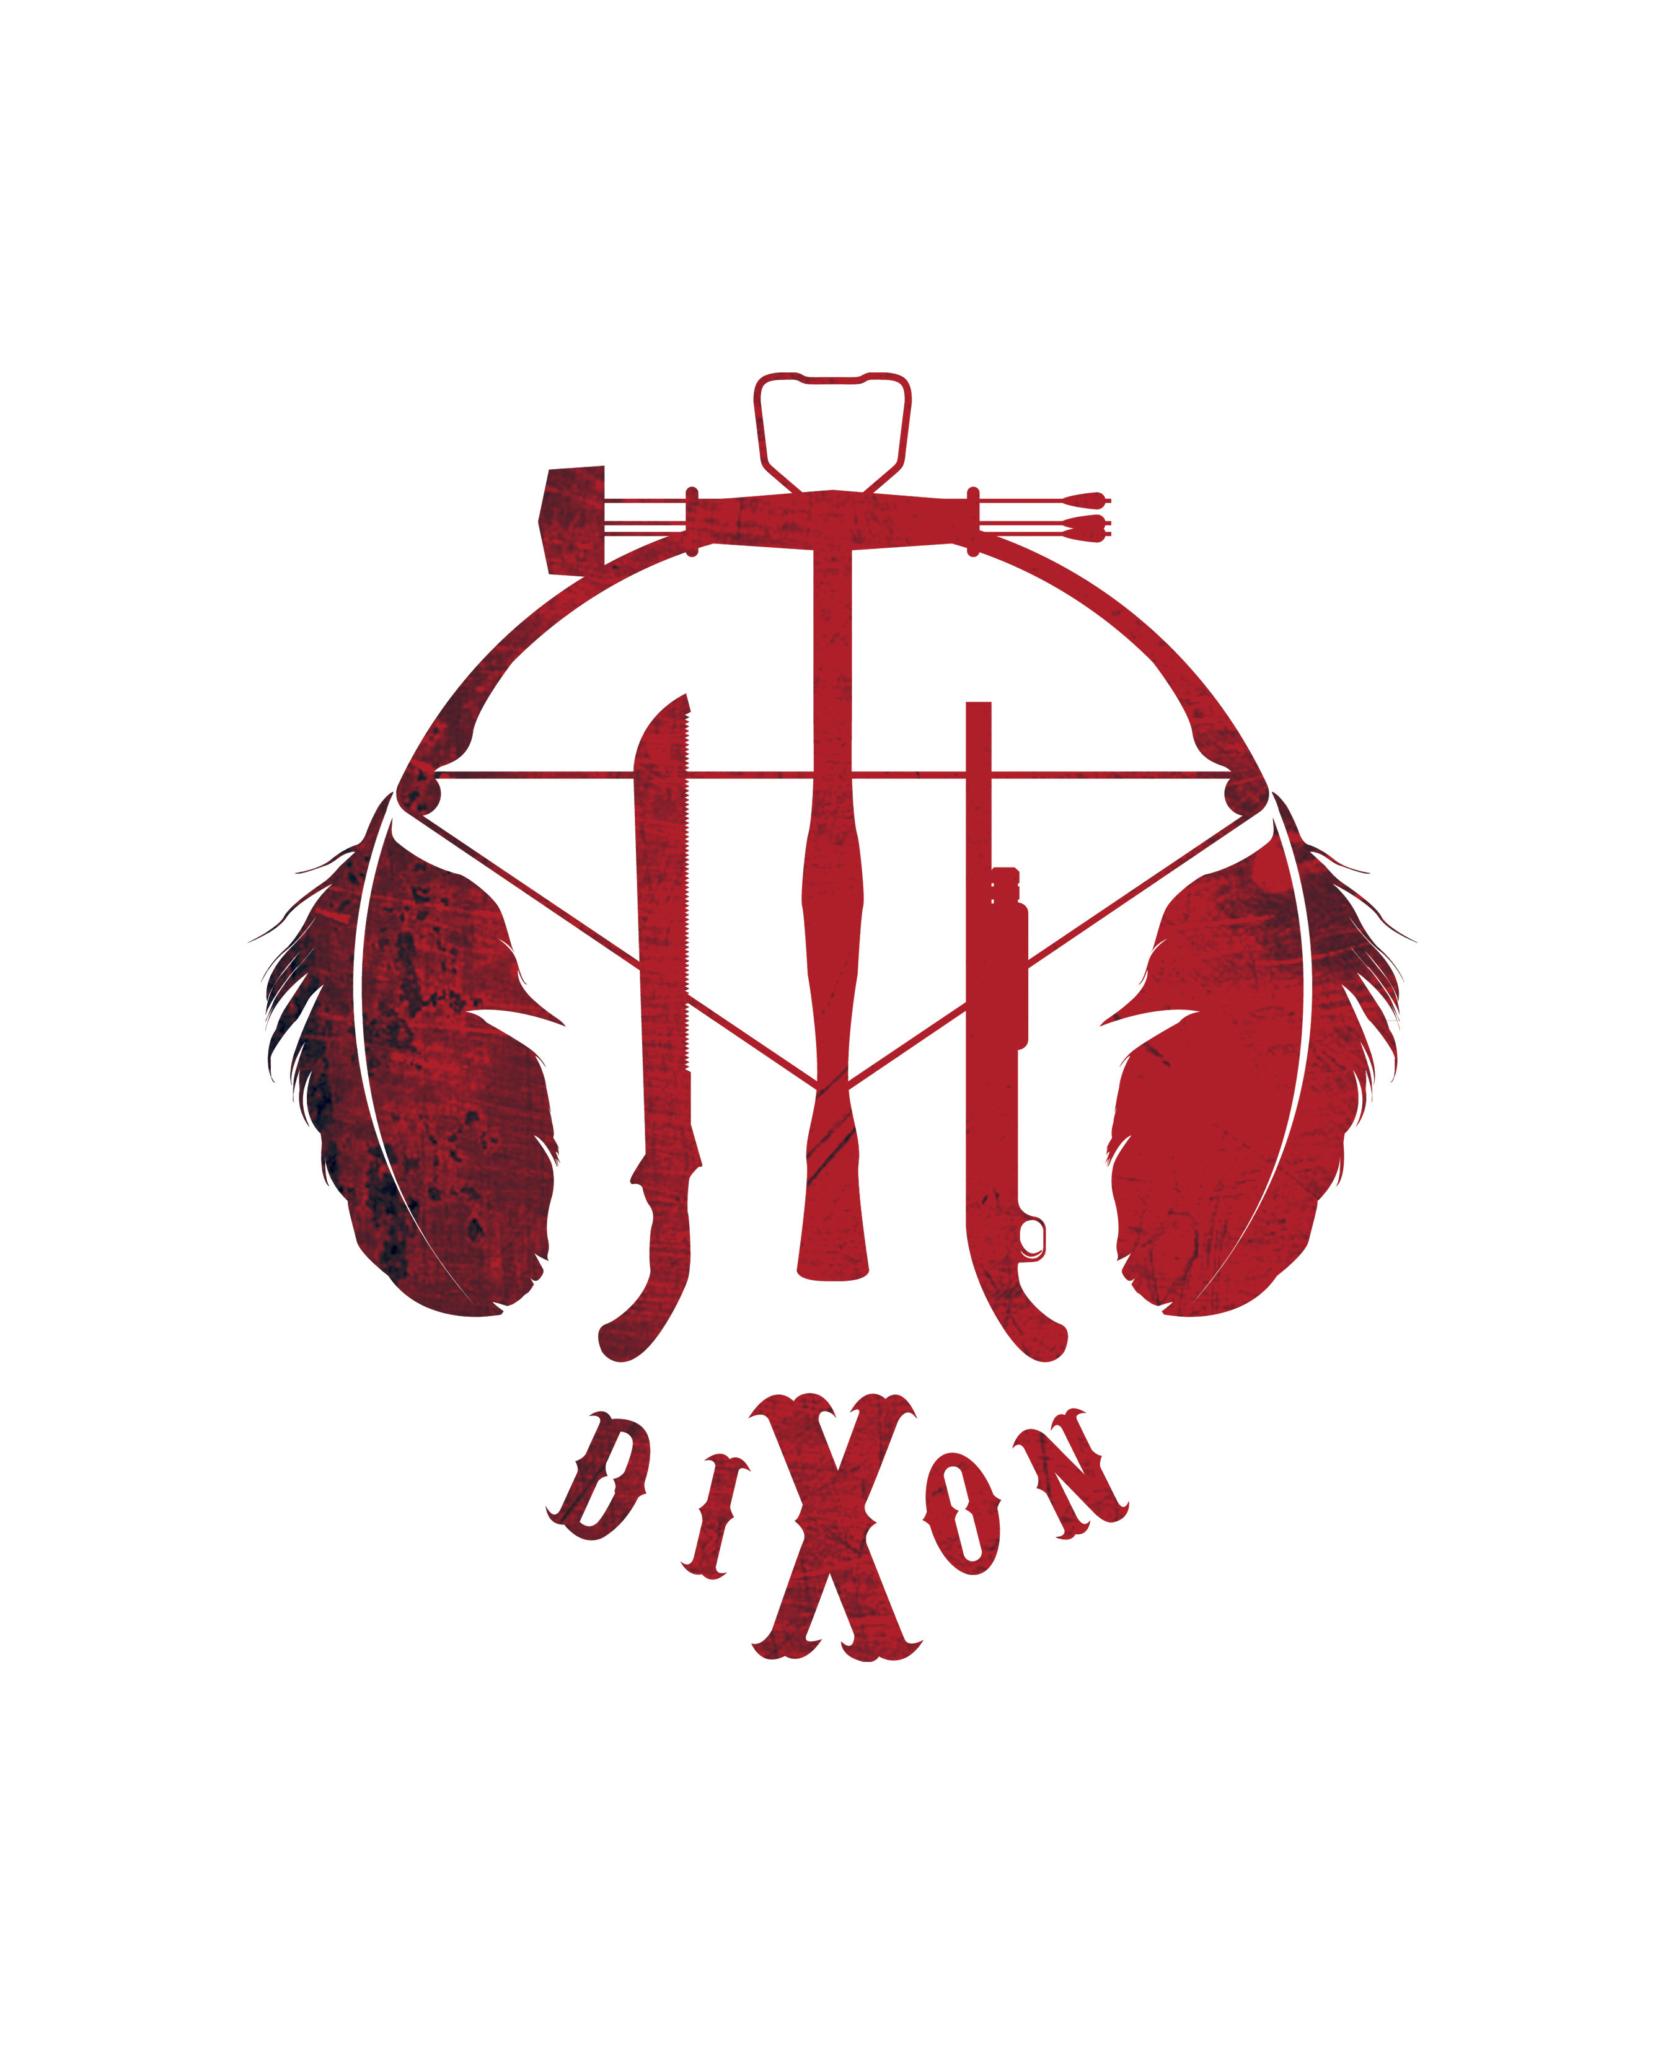 Daryl Dixon T-shirt Designs 51